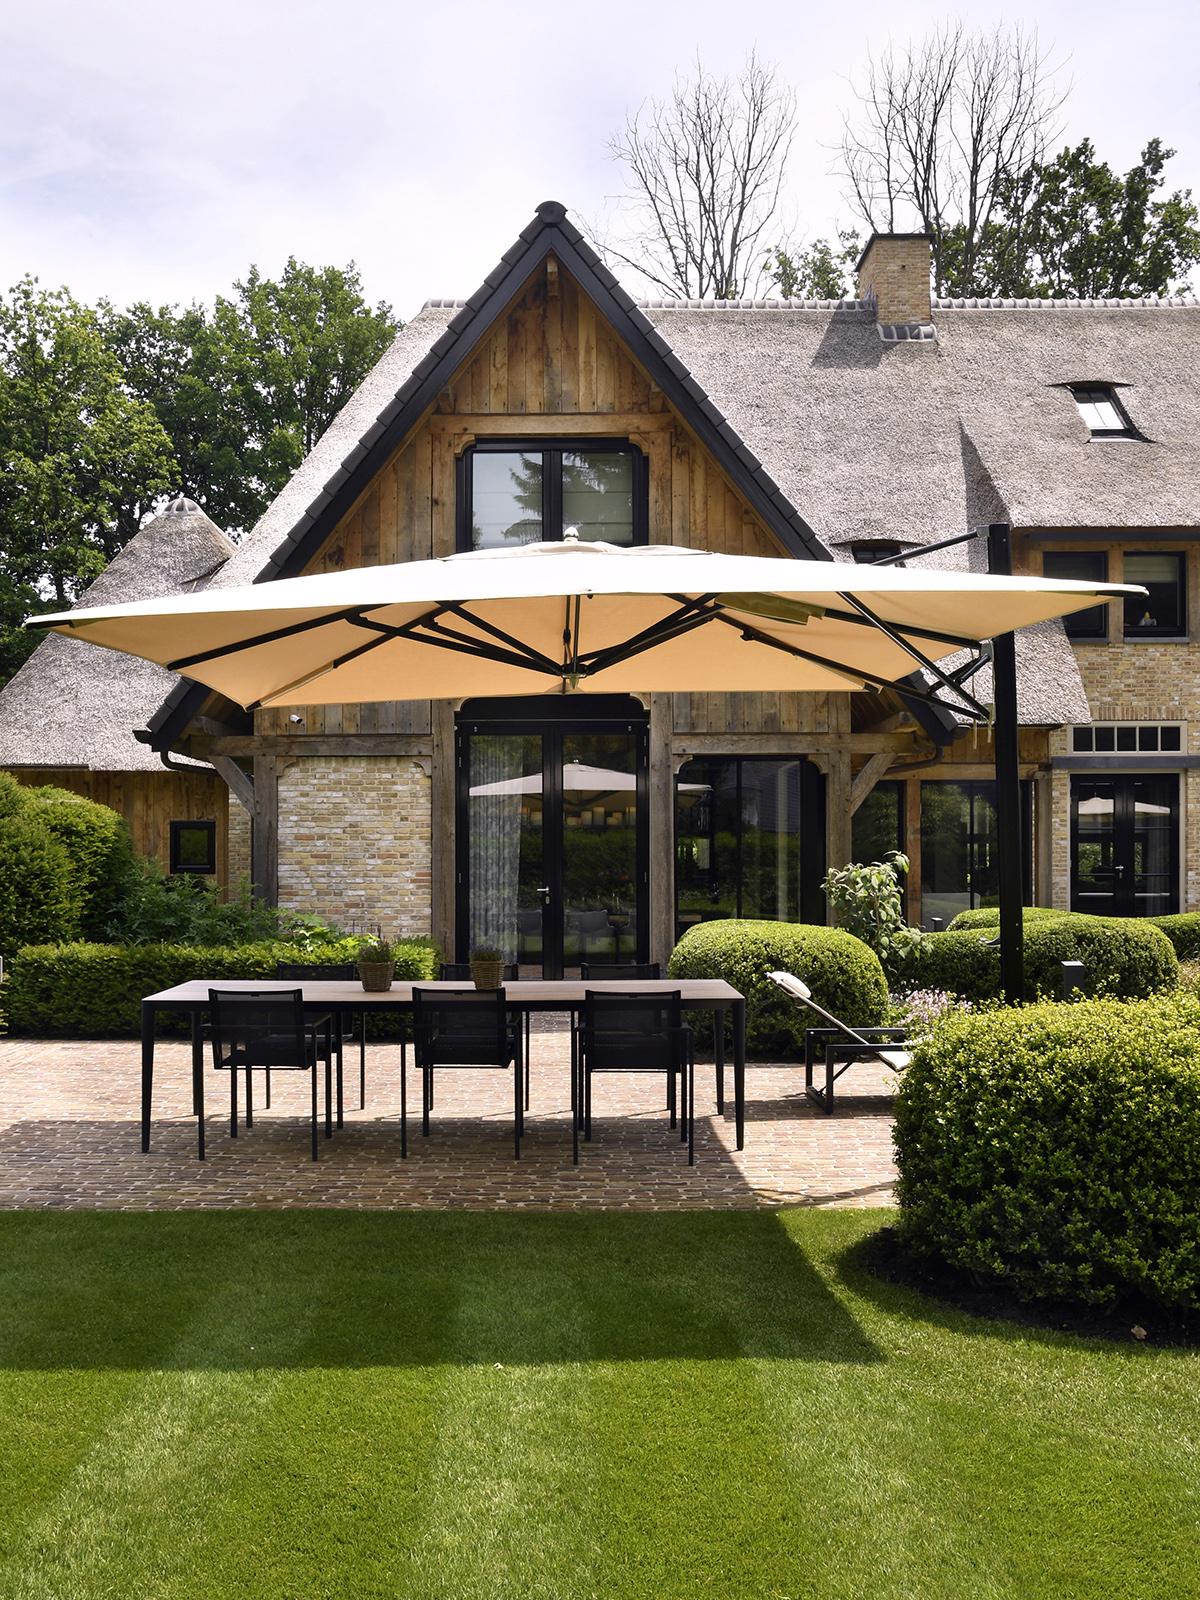 Design parasol, TUUCI, the art of living